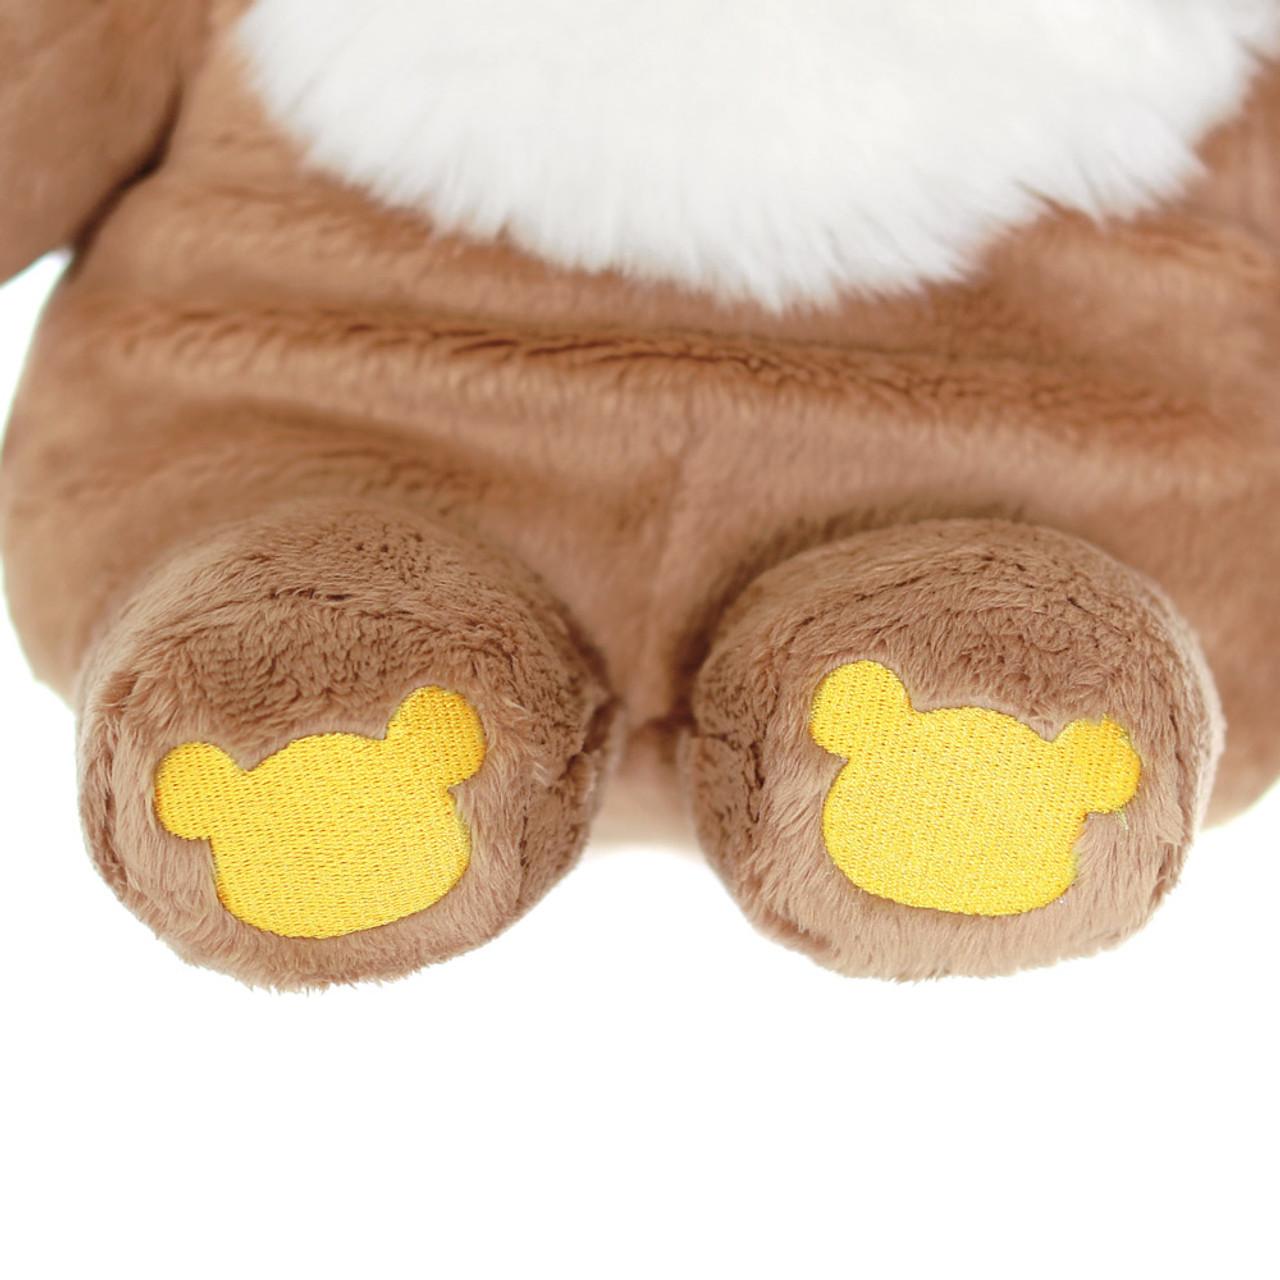 San-x Cute Sweet Chairoikoguma Bear Stuffed Animal Toy L MR94401 ( Foot View )